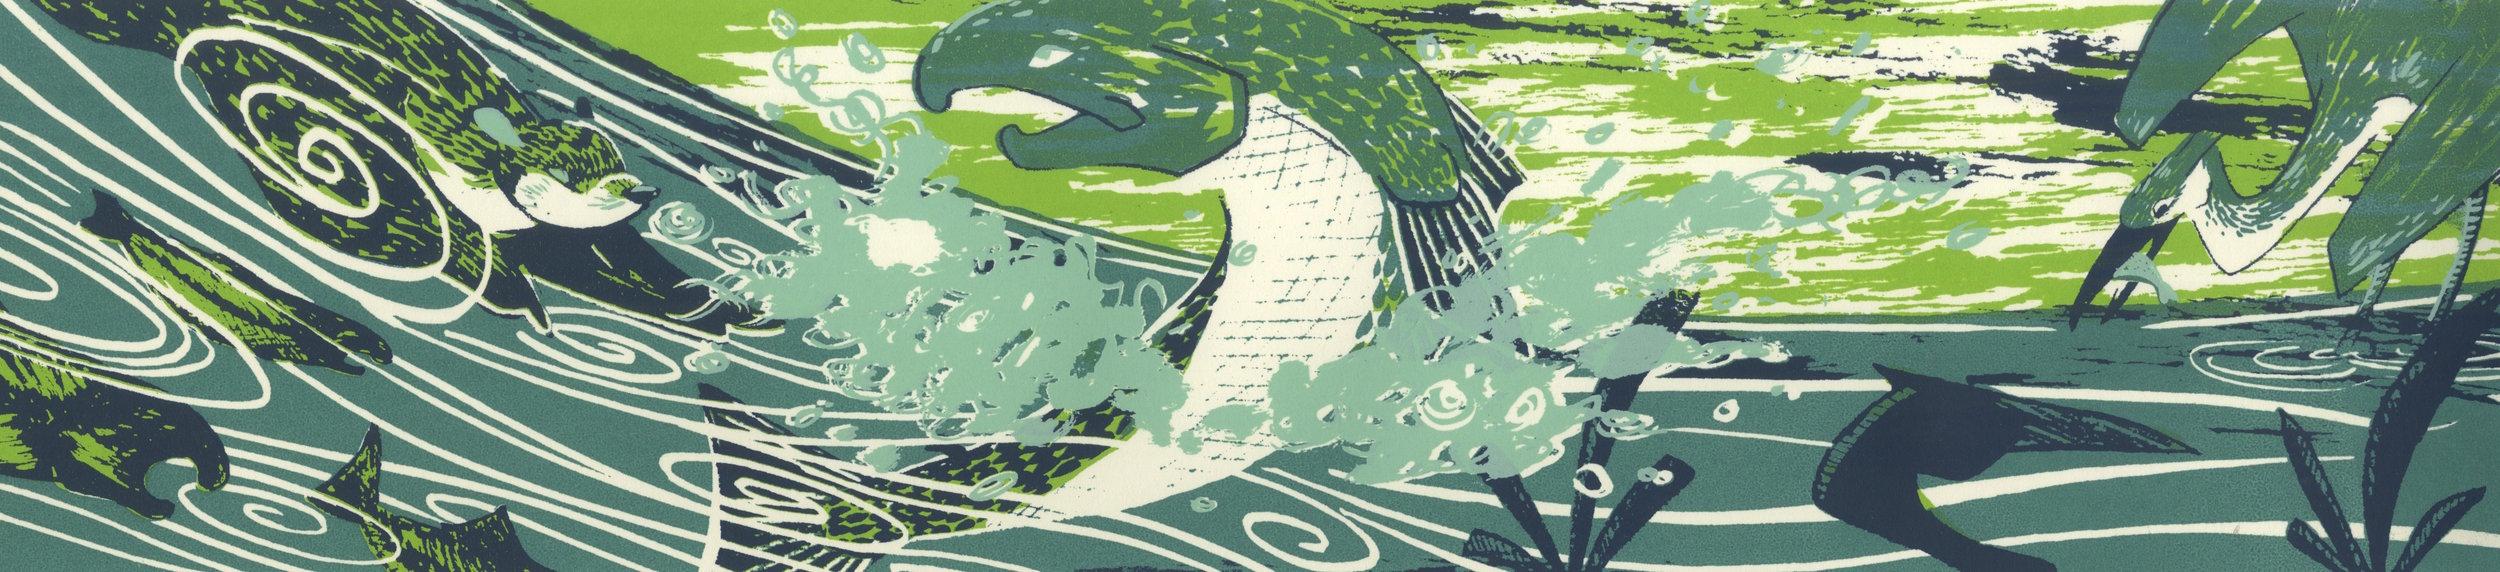 River. Four-layer screen print.